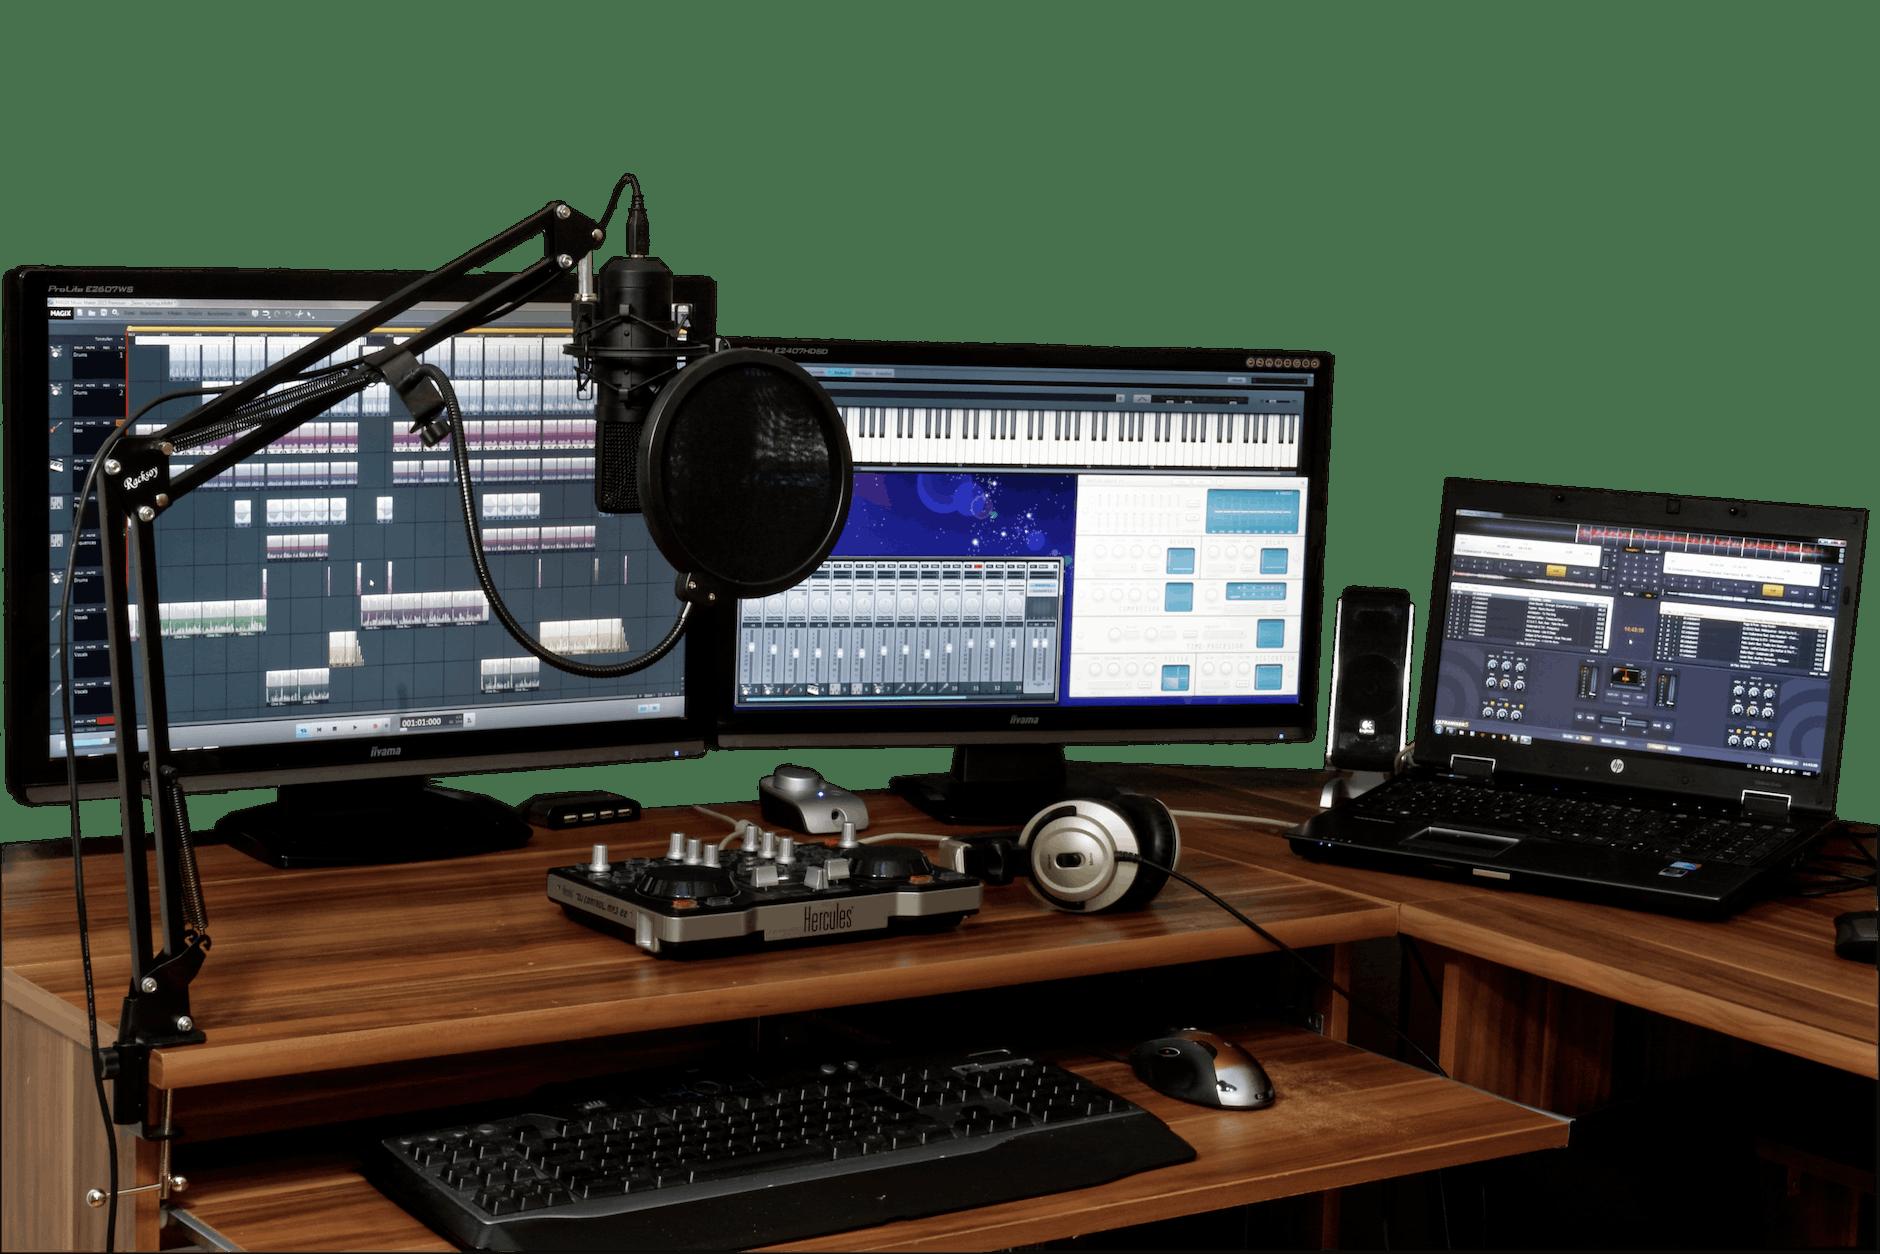 audio set and desktops